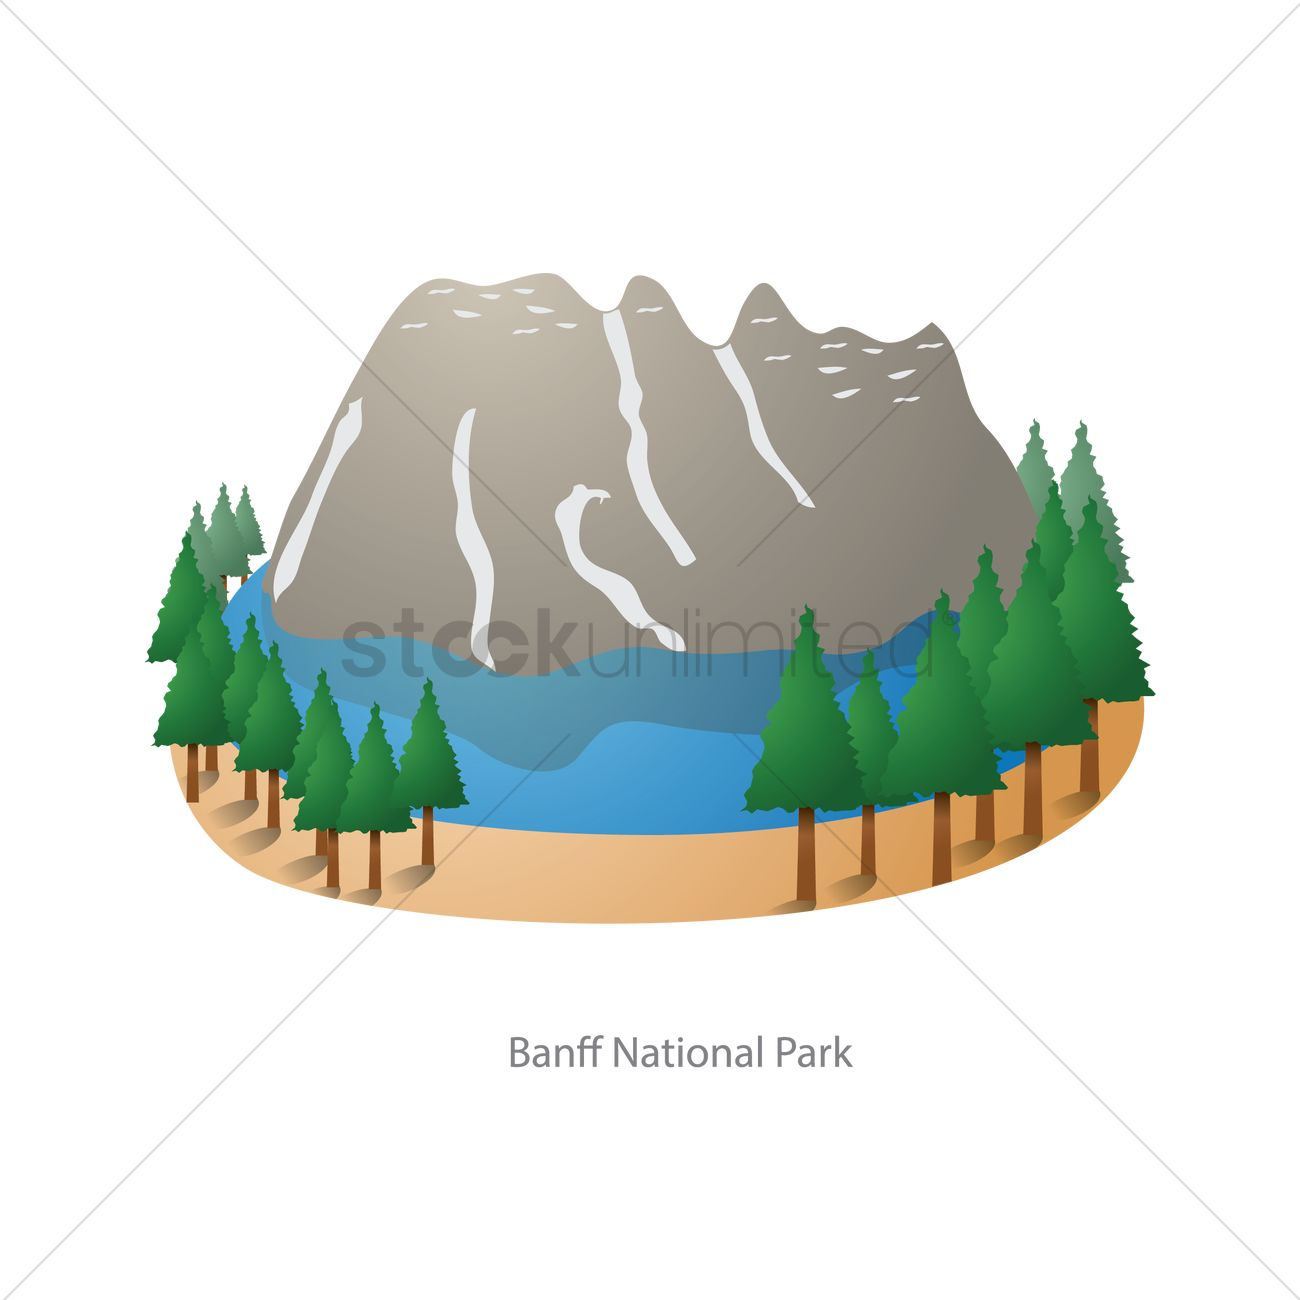 1300x1300 Banff National Park Vector Image